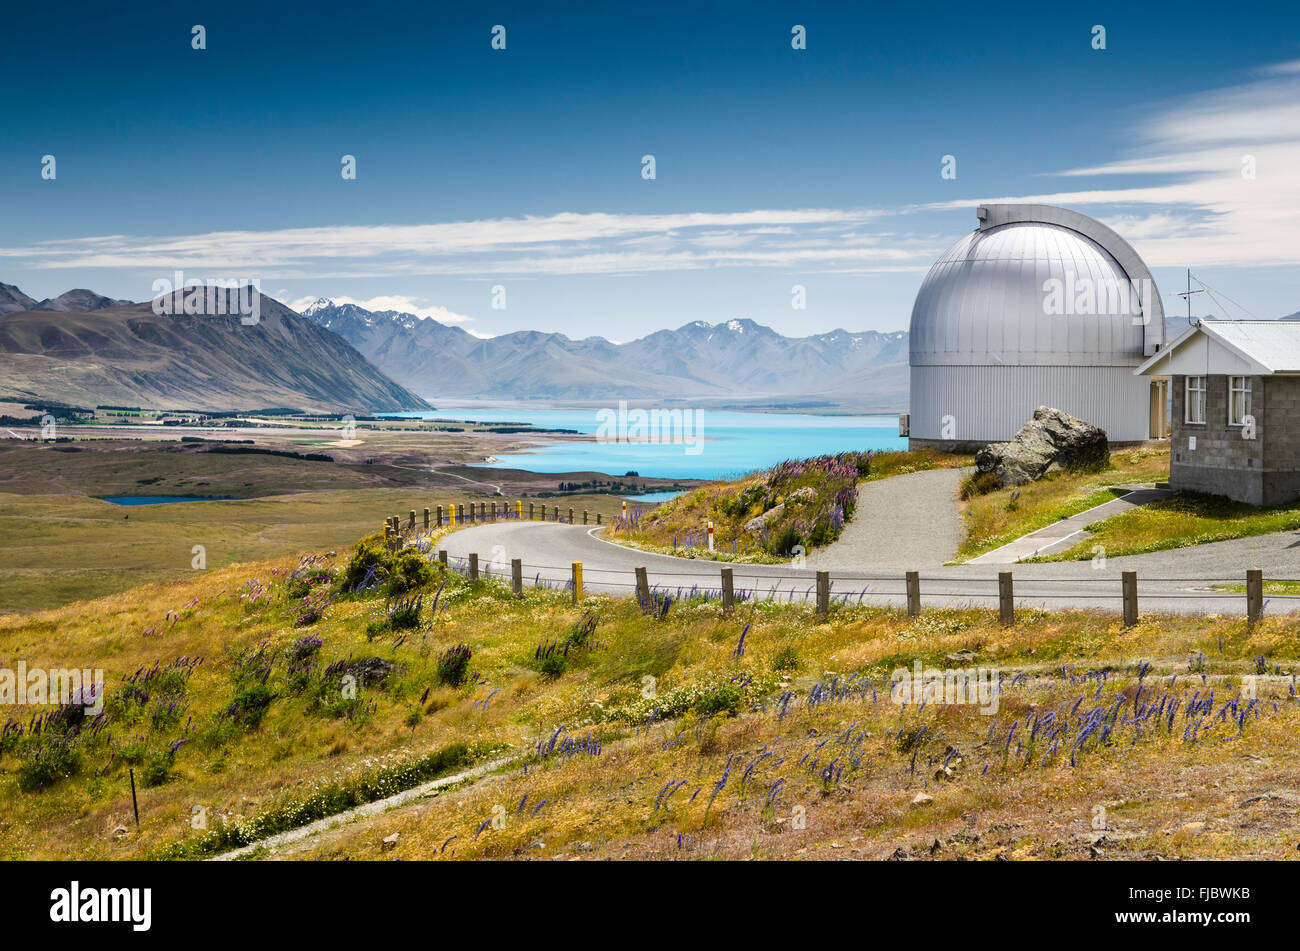 Montare John University Observatory, turchese Lago Tekapo dietro, Tekapo Highlands, Tekapo, Twizel, regione di Canterbury Immagini Stock